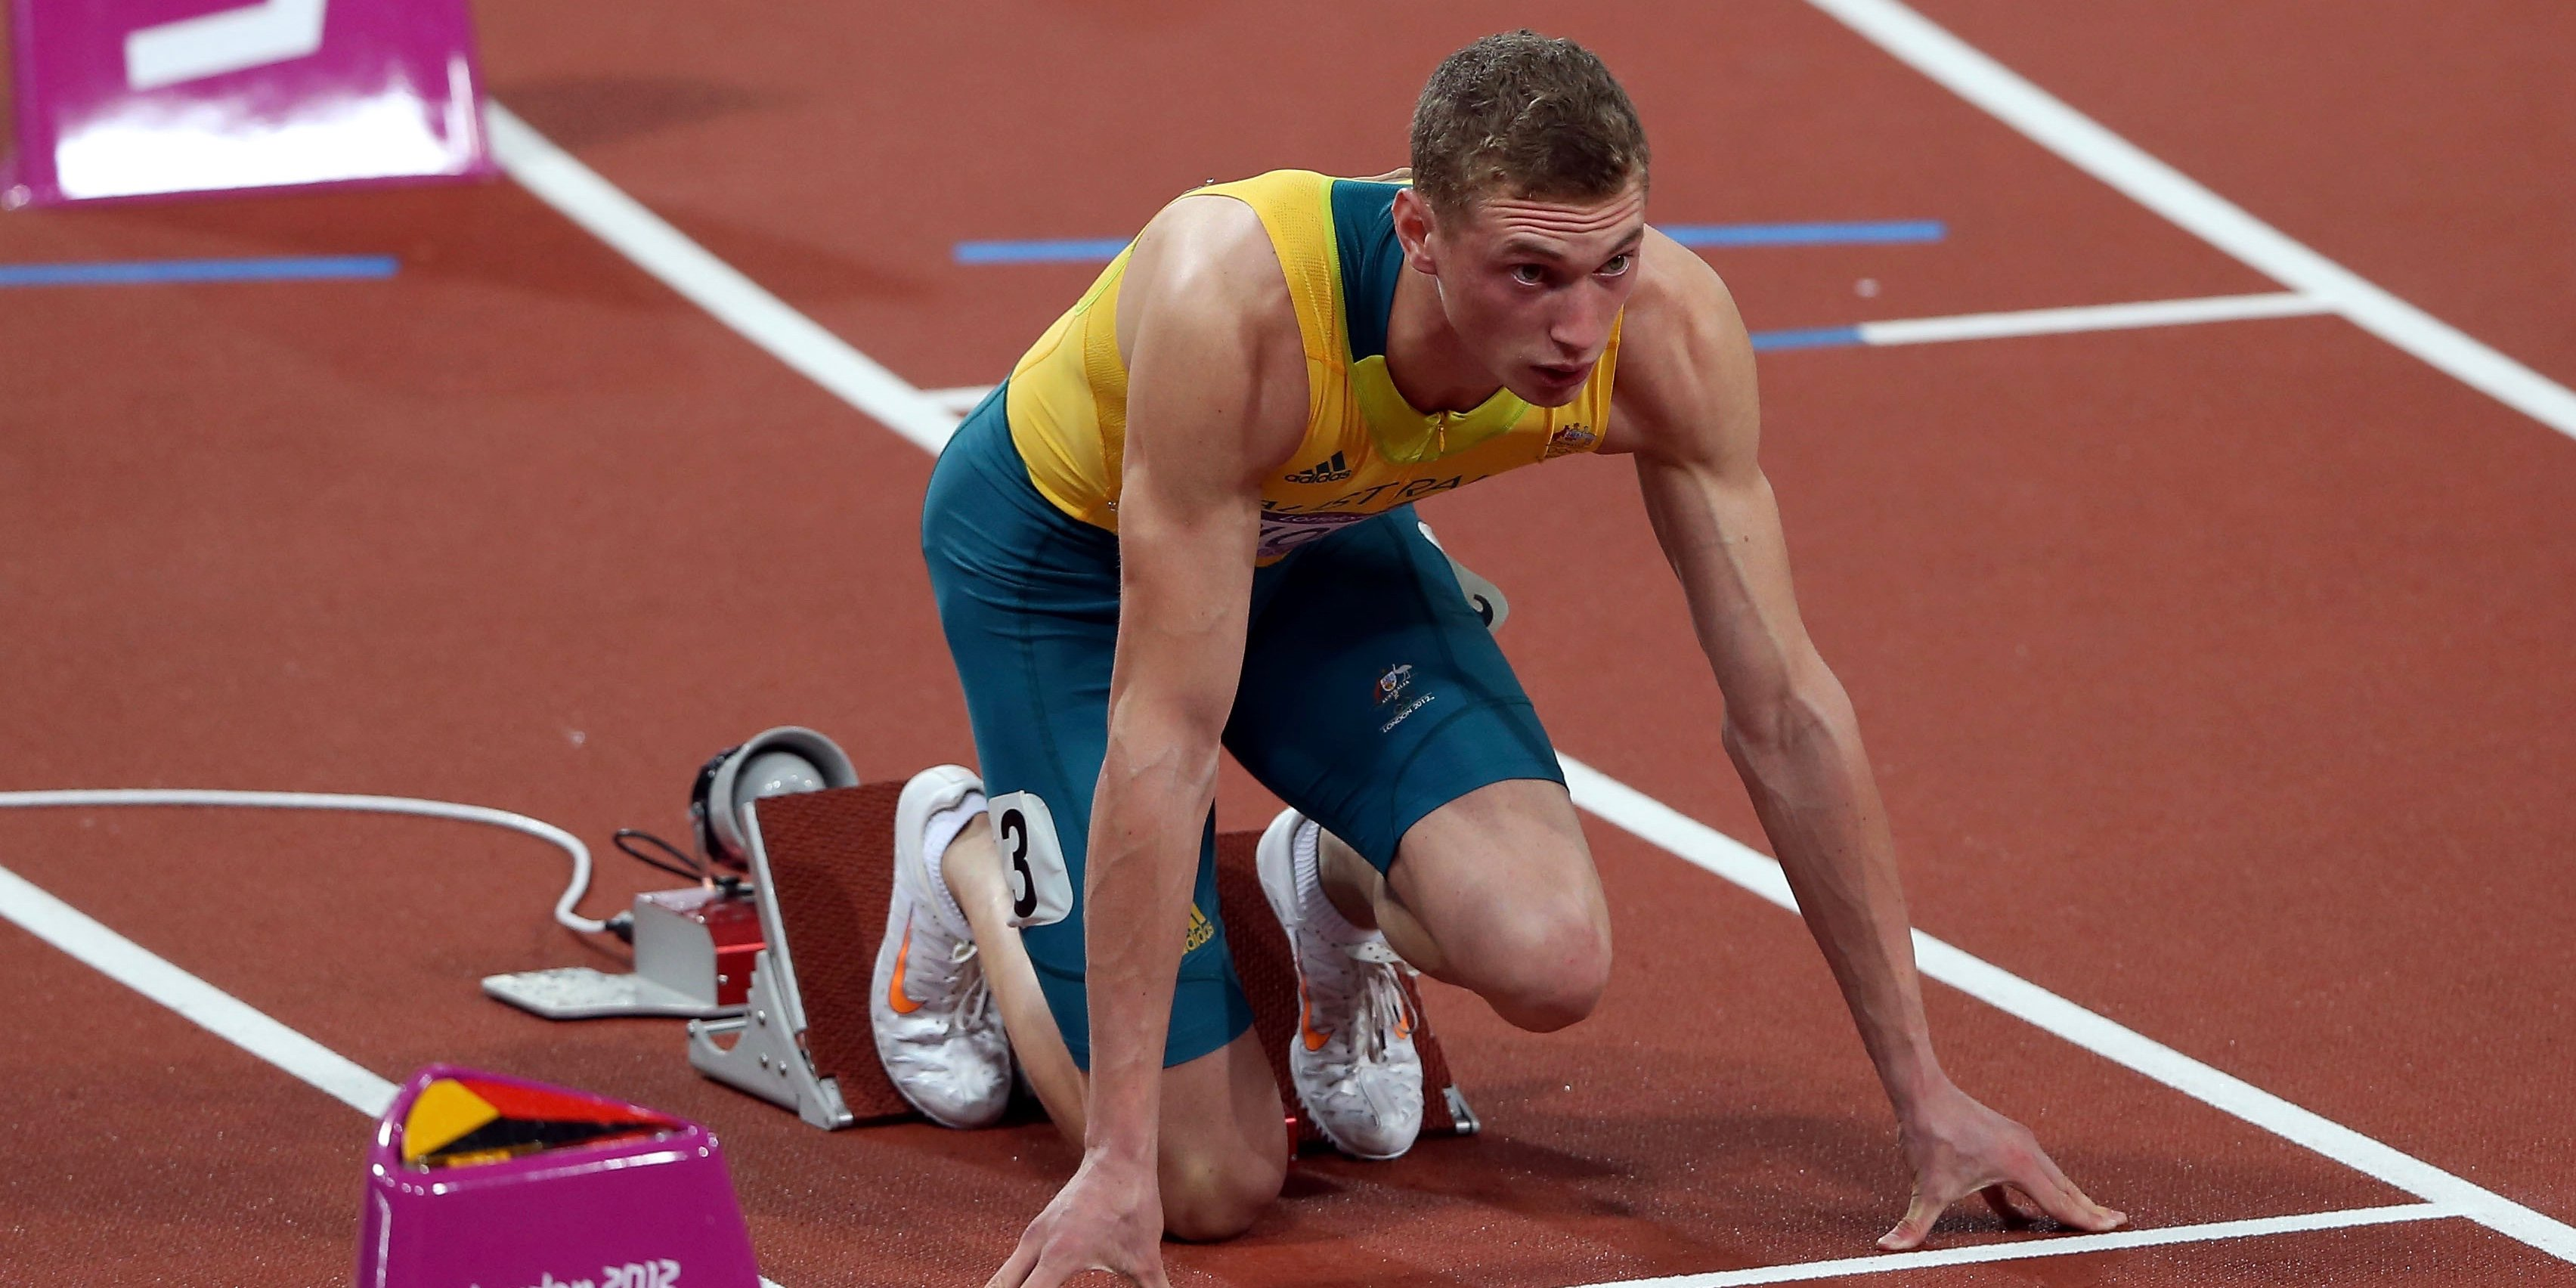 Steven Solomon (Courtesy of Getty Images)